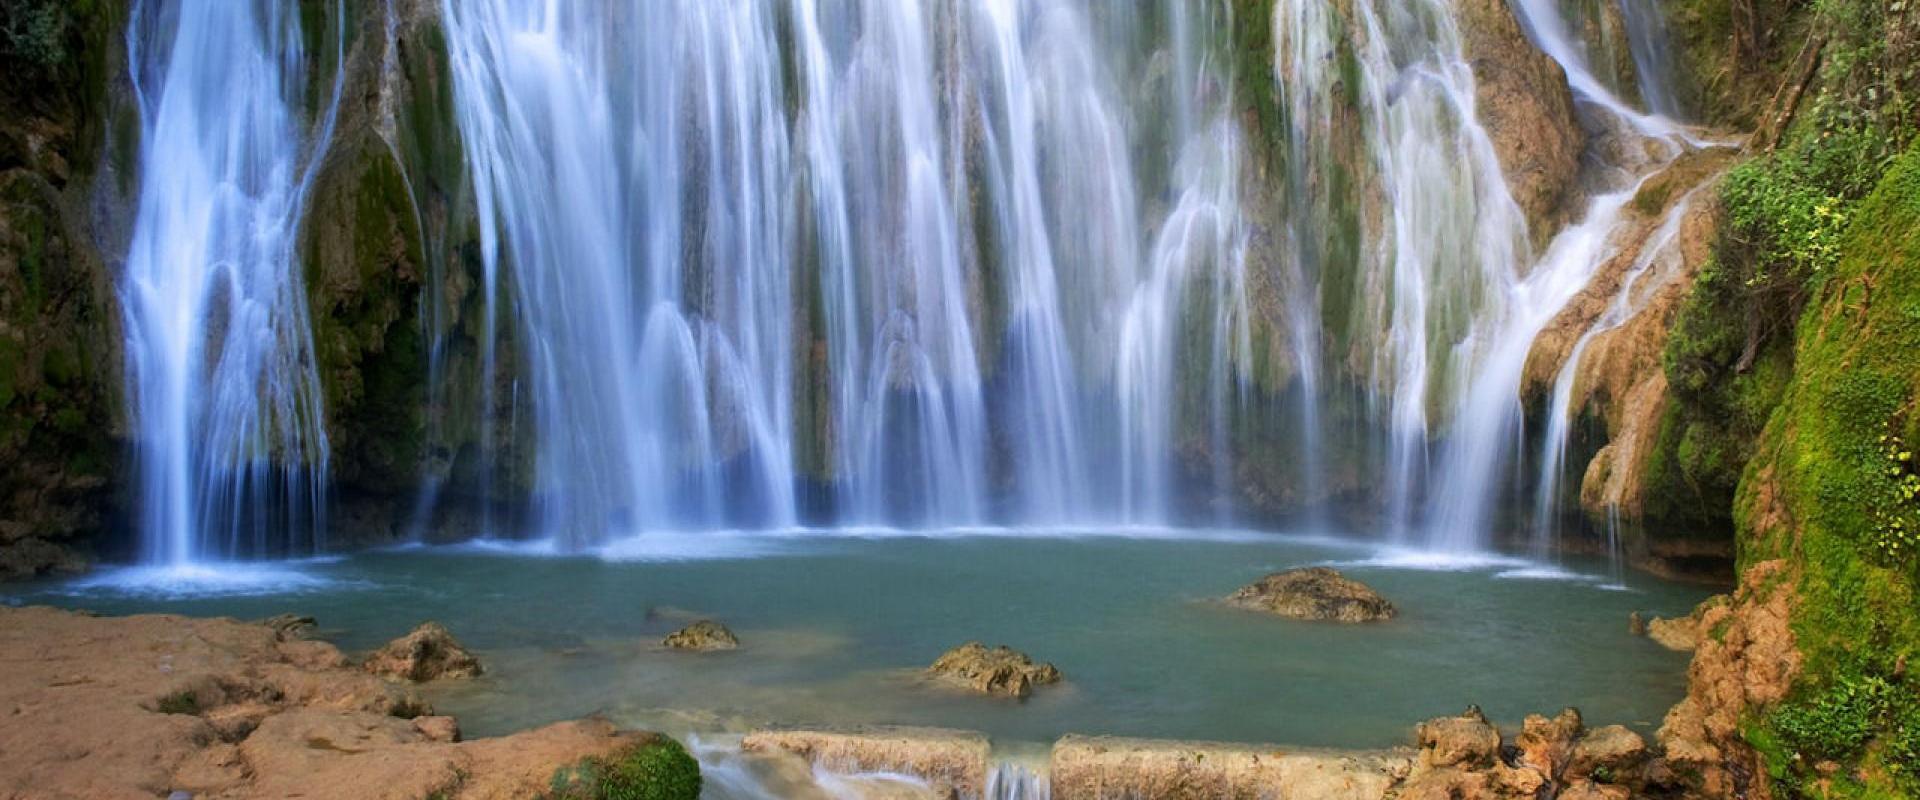 santo_domingo_waterfall1